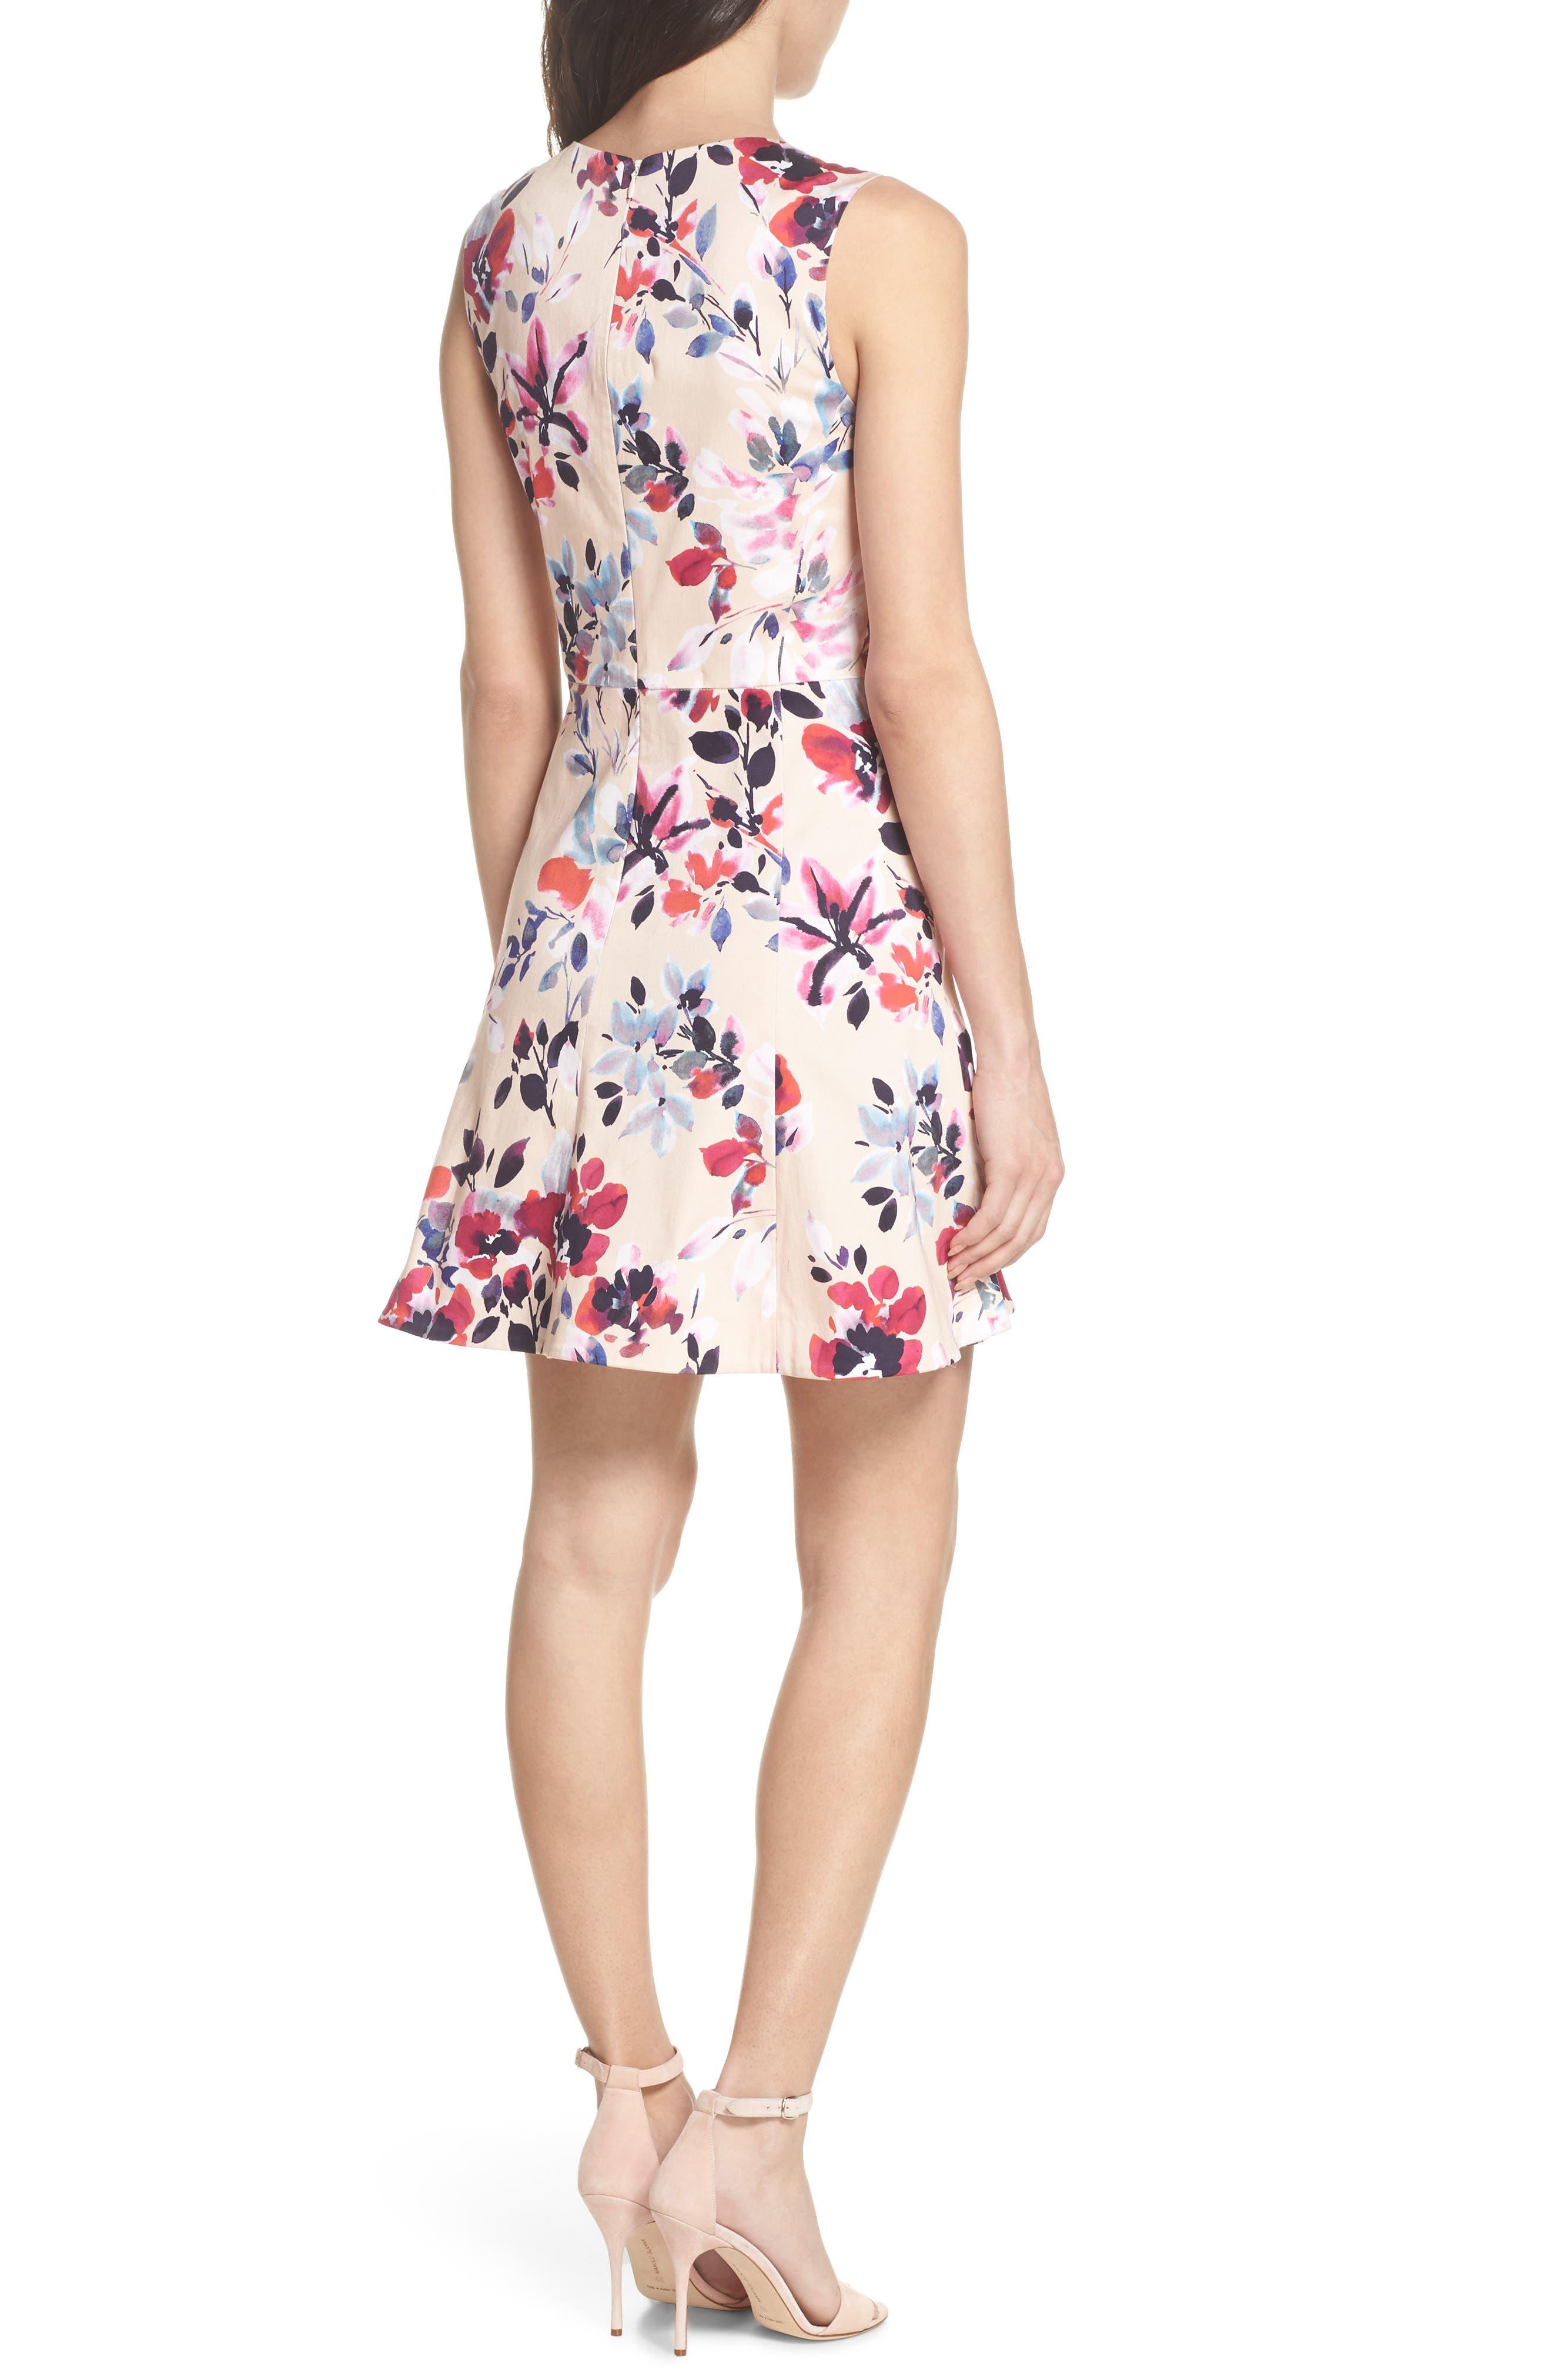 Linosa Fit & Flare Dress,                             Alternate thumbnail 2, color,                             Barley Pink